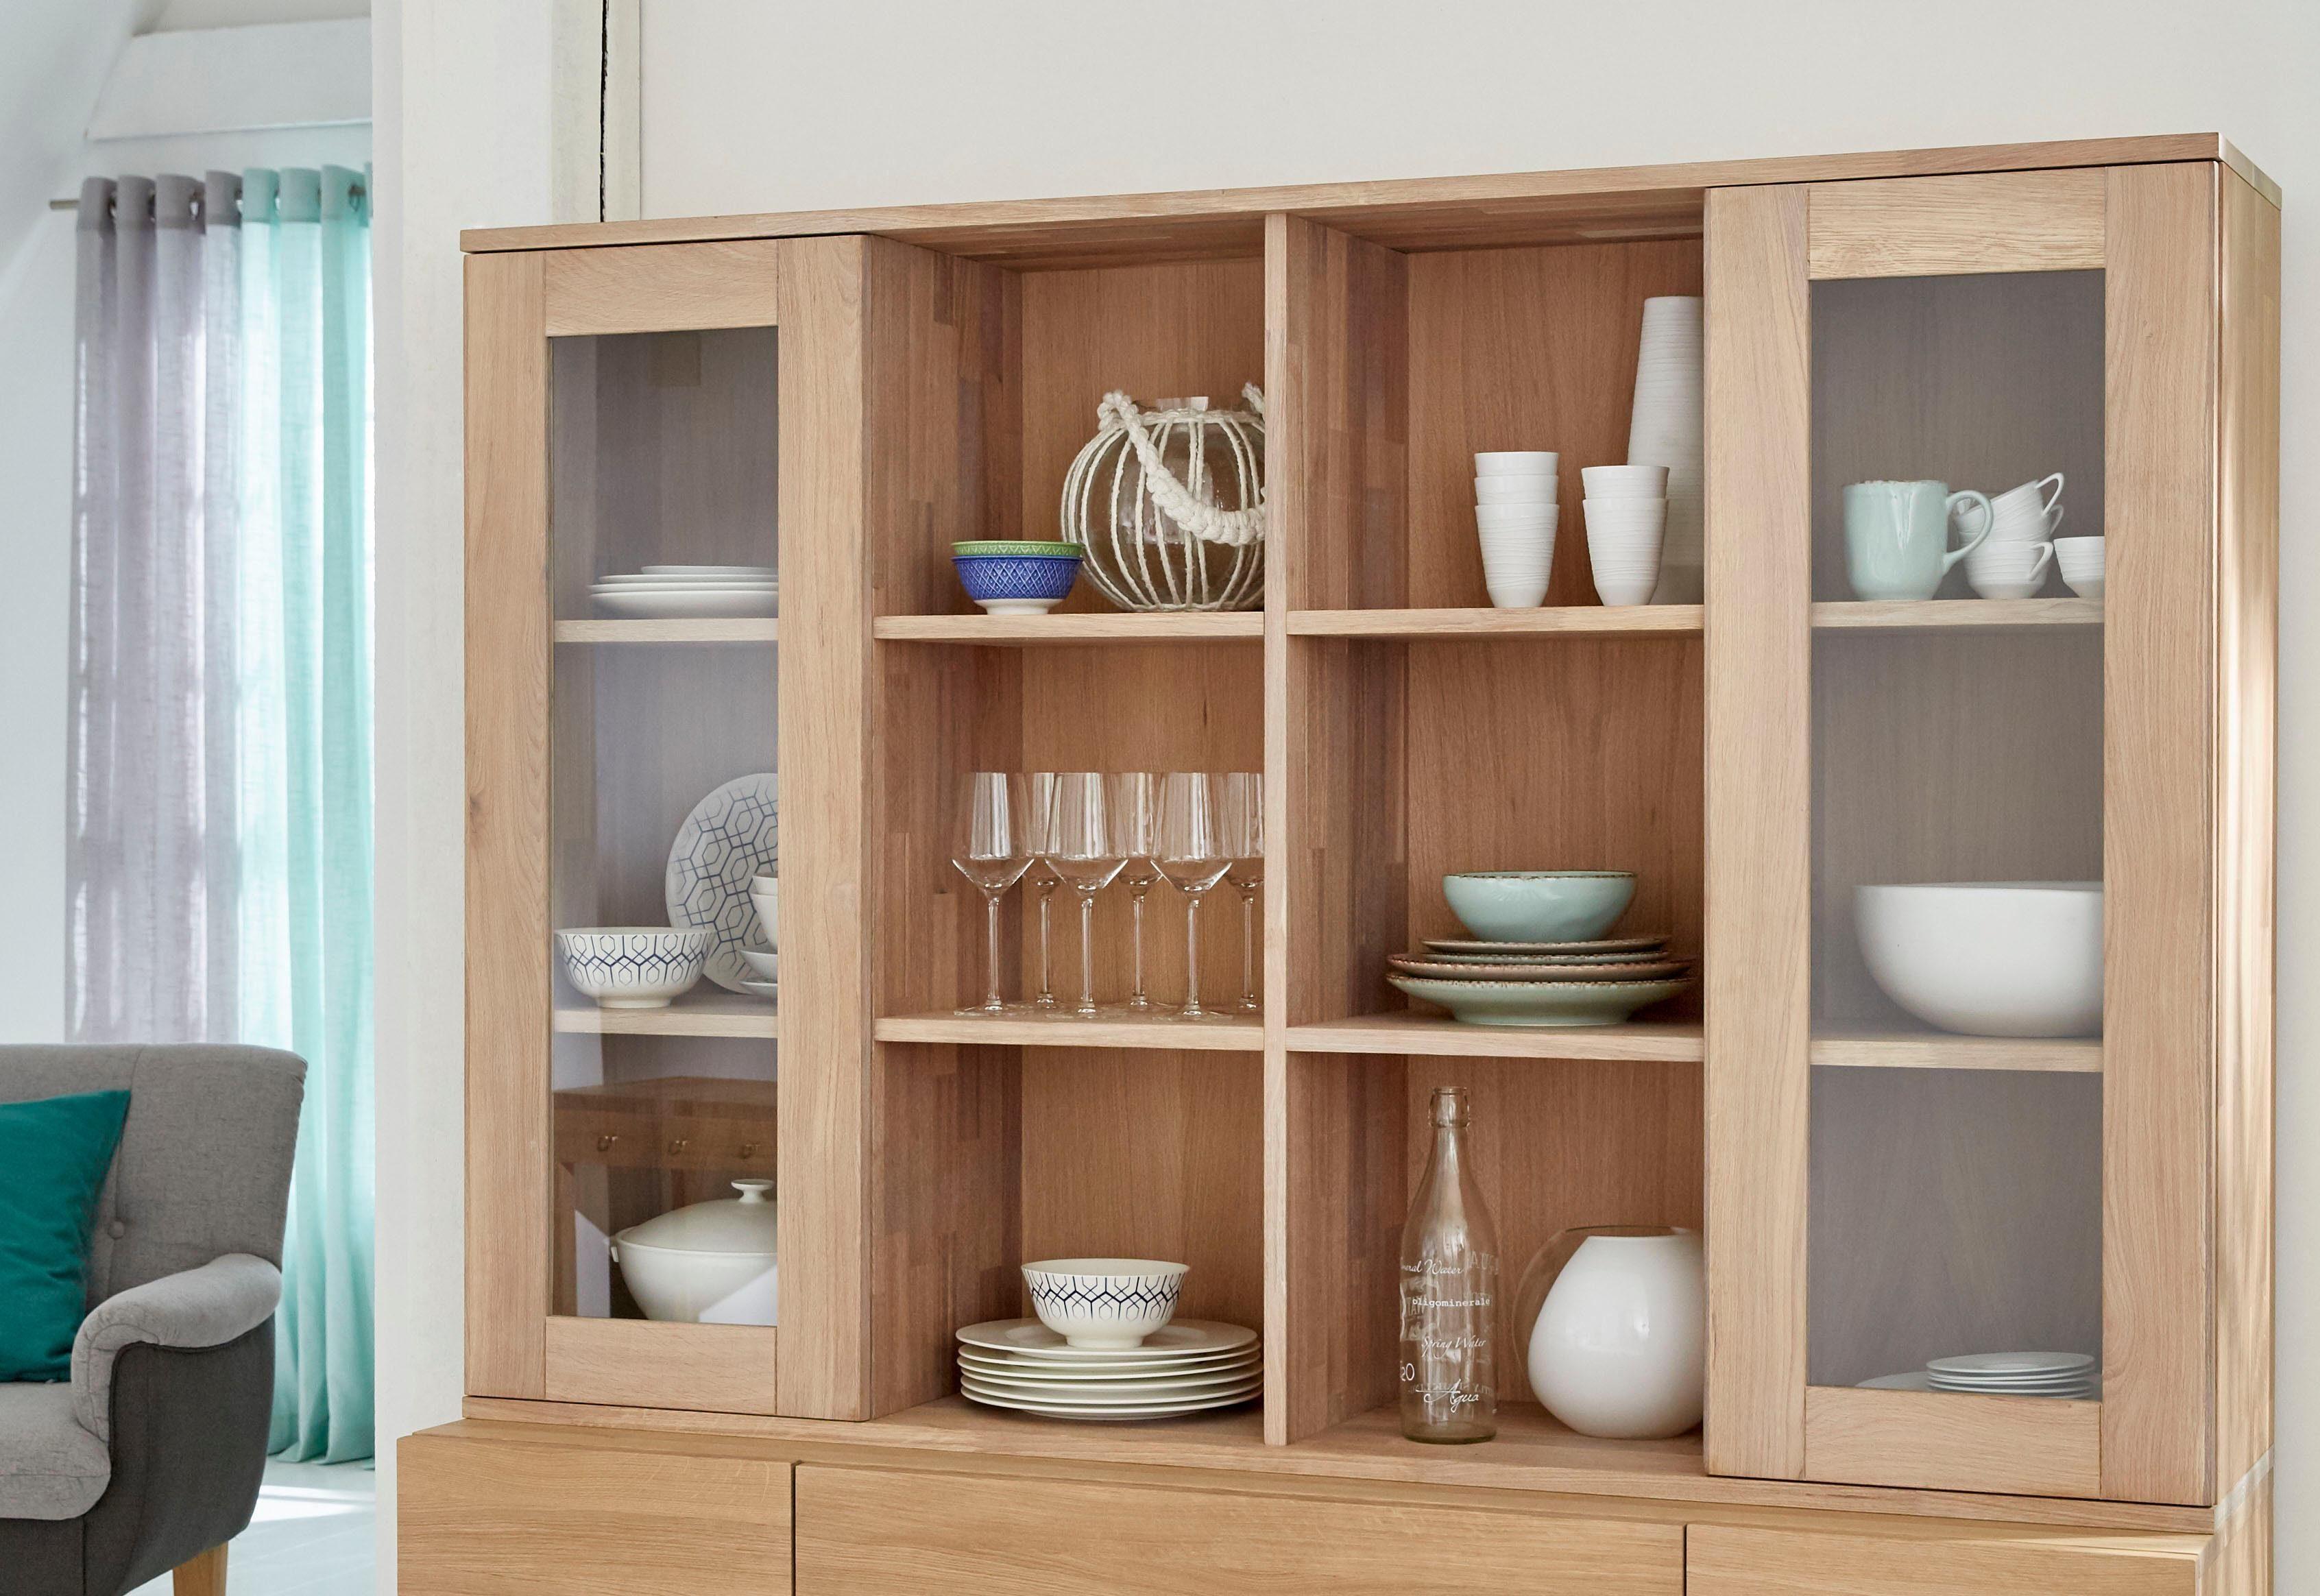 GMK Home & Living Buffetaufsatz «Evenio», aus massiver Eiche, Breite 160 cm